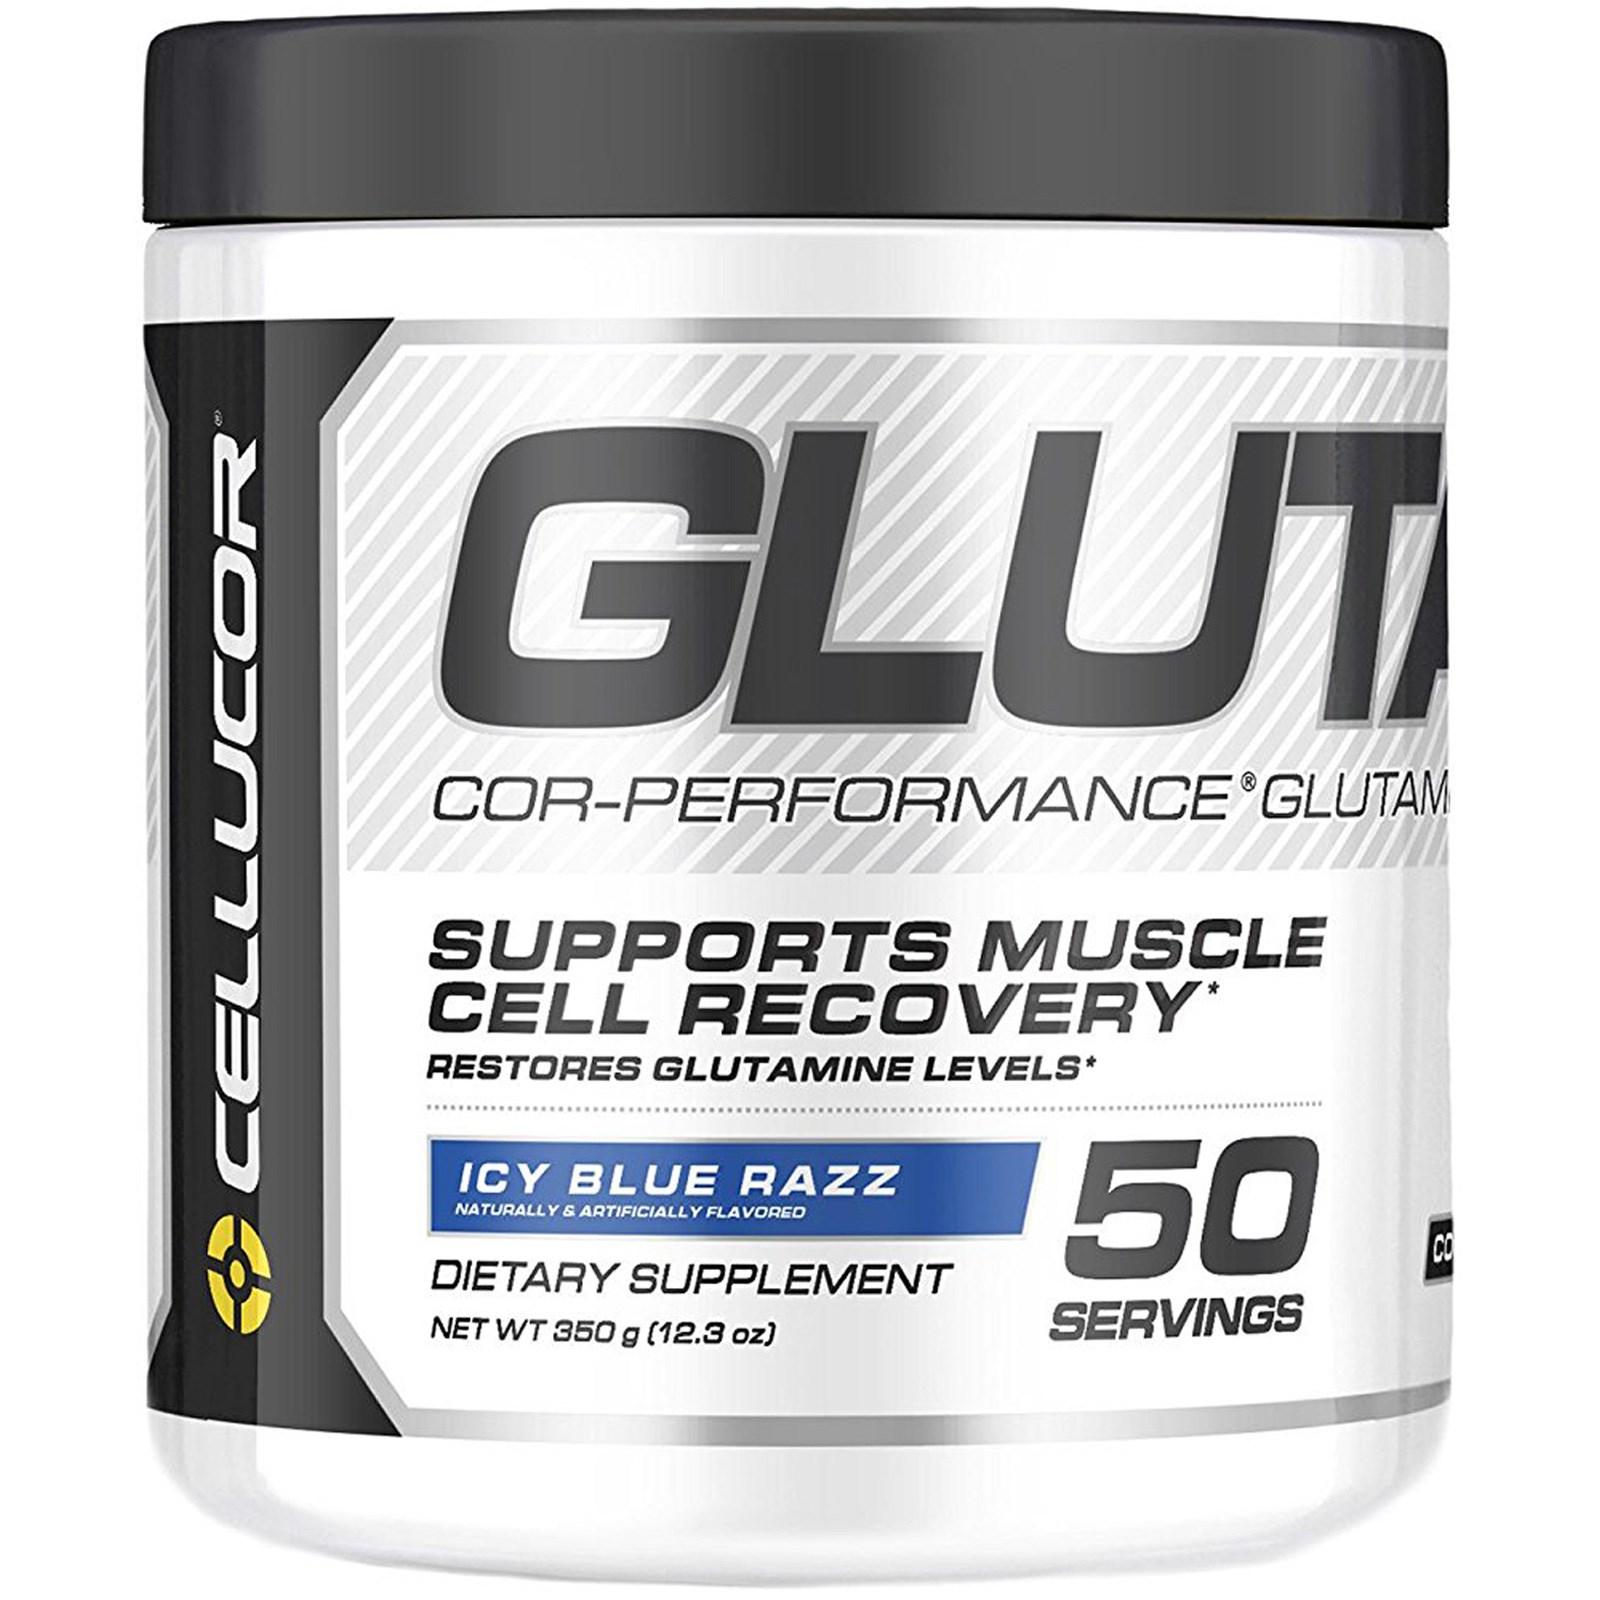 Cellucor Cor Performance Glutamine Icy Blue Razz 123 Oz 350 G